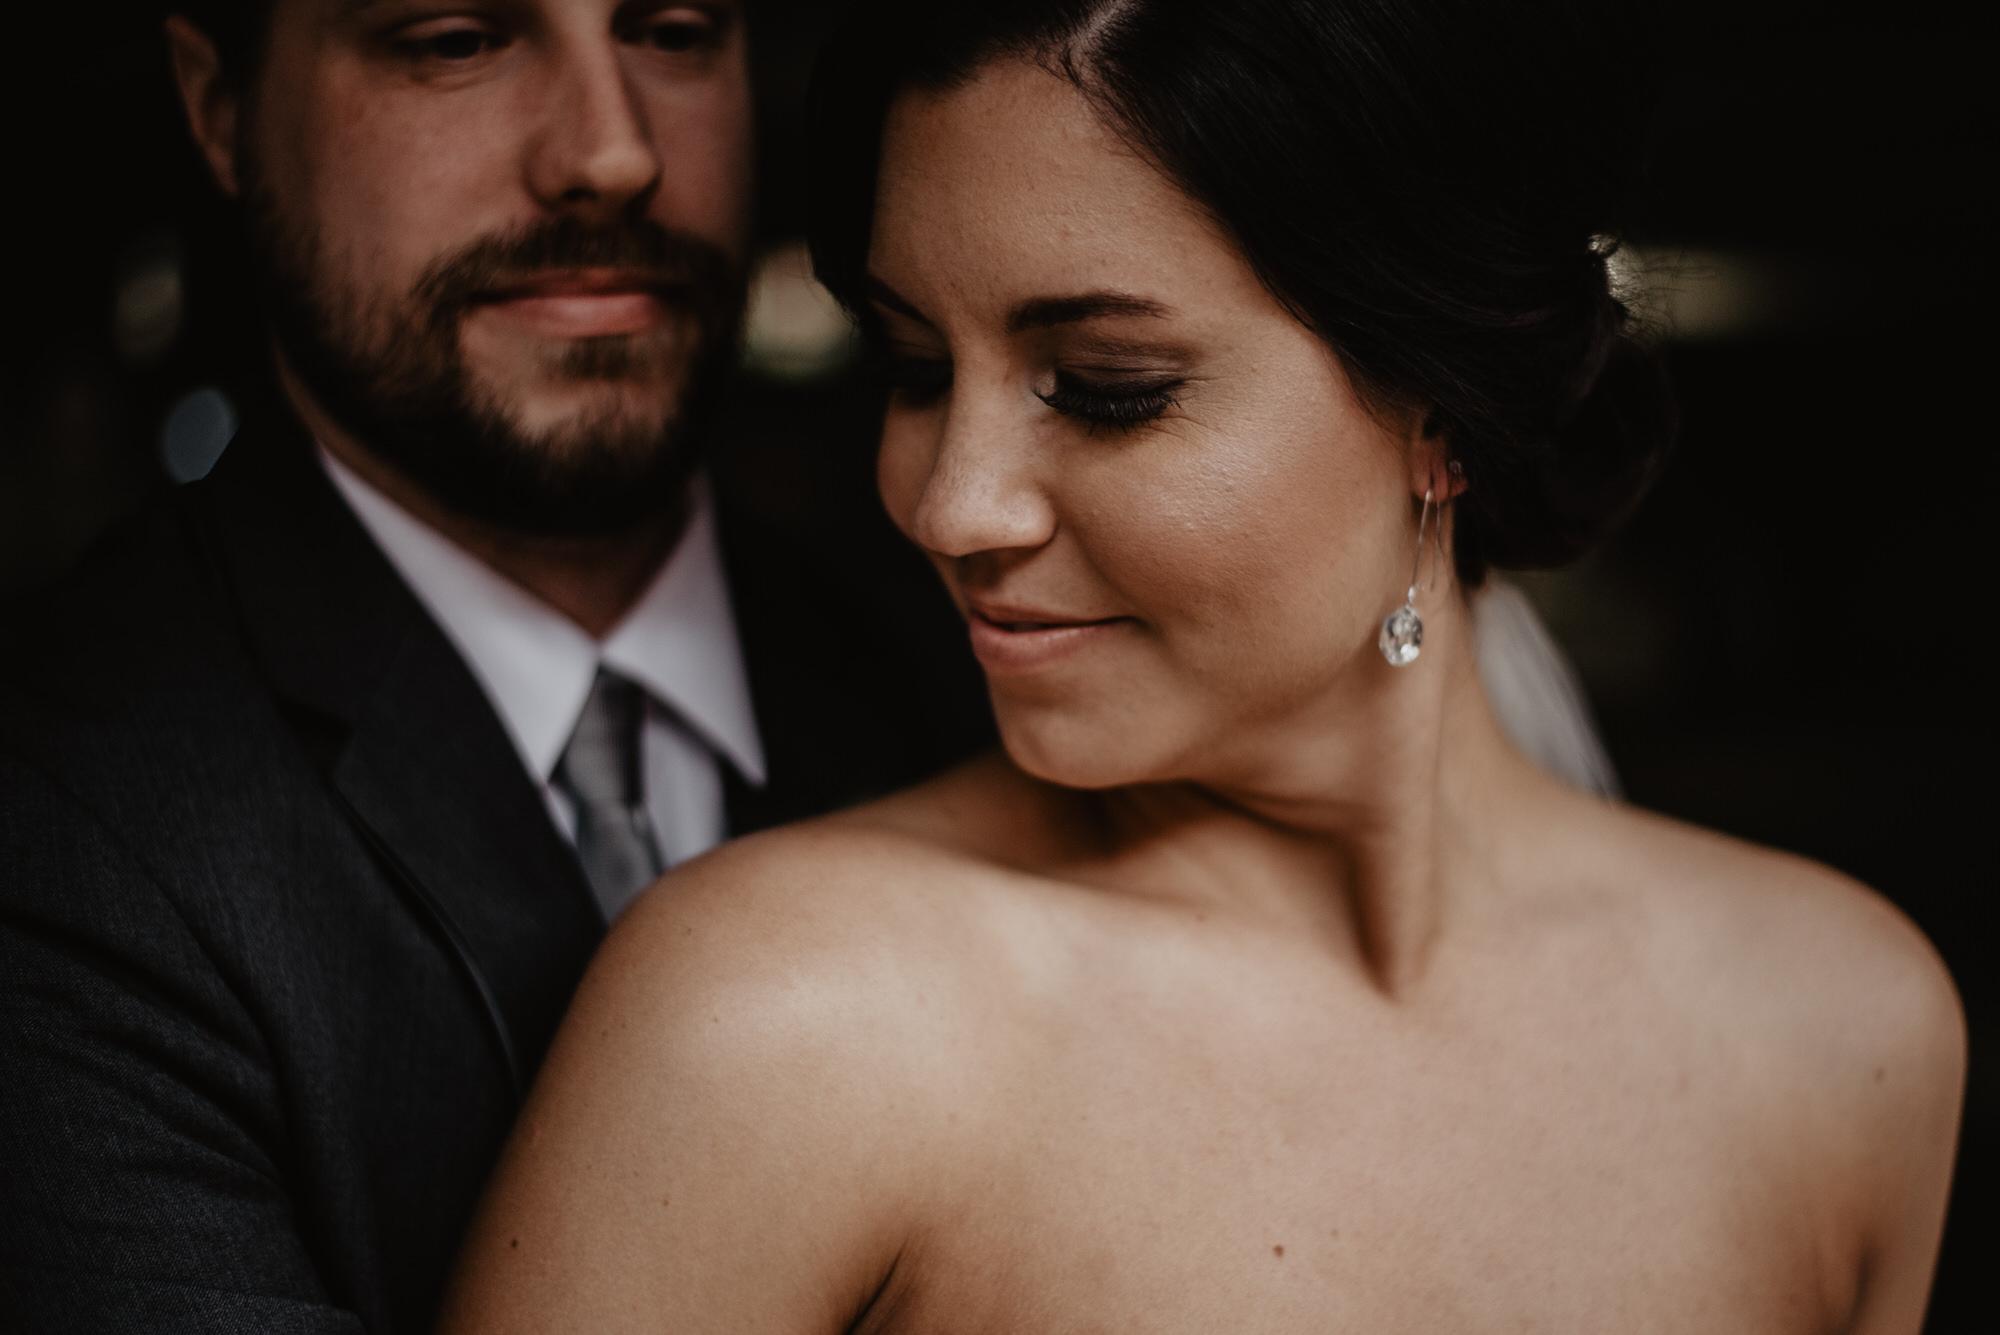 Kaylie_Sirek_Photography_Grand_Island_Kearney_Hastings_Lincoln_Nebraska_Wedding_Engagement_Grandma_Grandparent_Delray_Downtown_DowntownLincoln_LNK_Emotional_Bride_Groom_Photographer_21.jpg